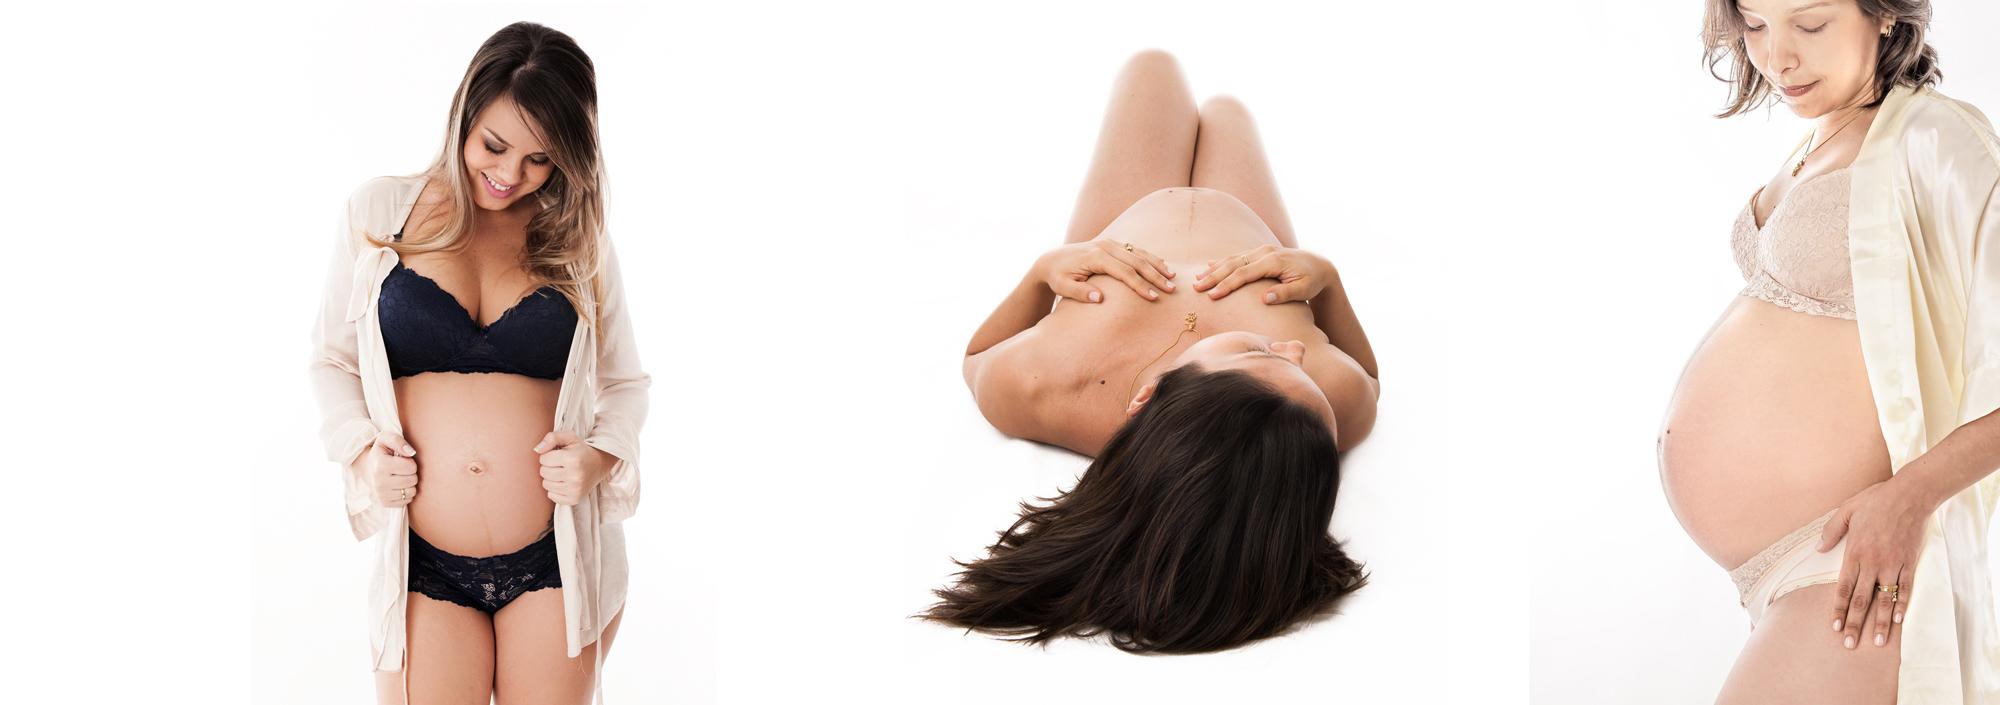 Ensaio Gestante, pragnancy